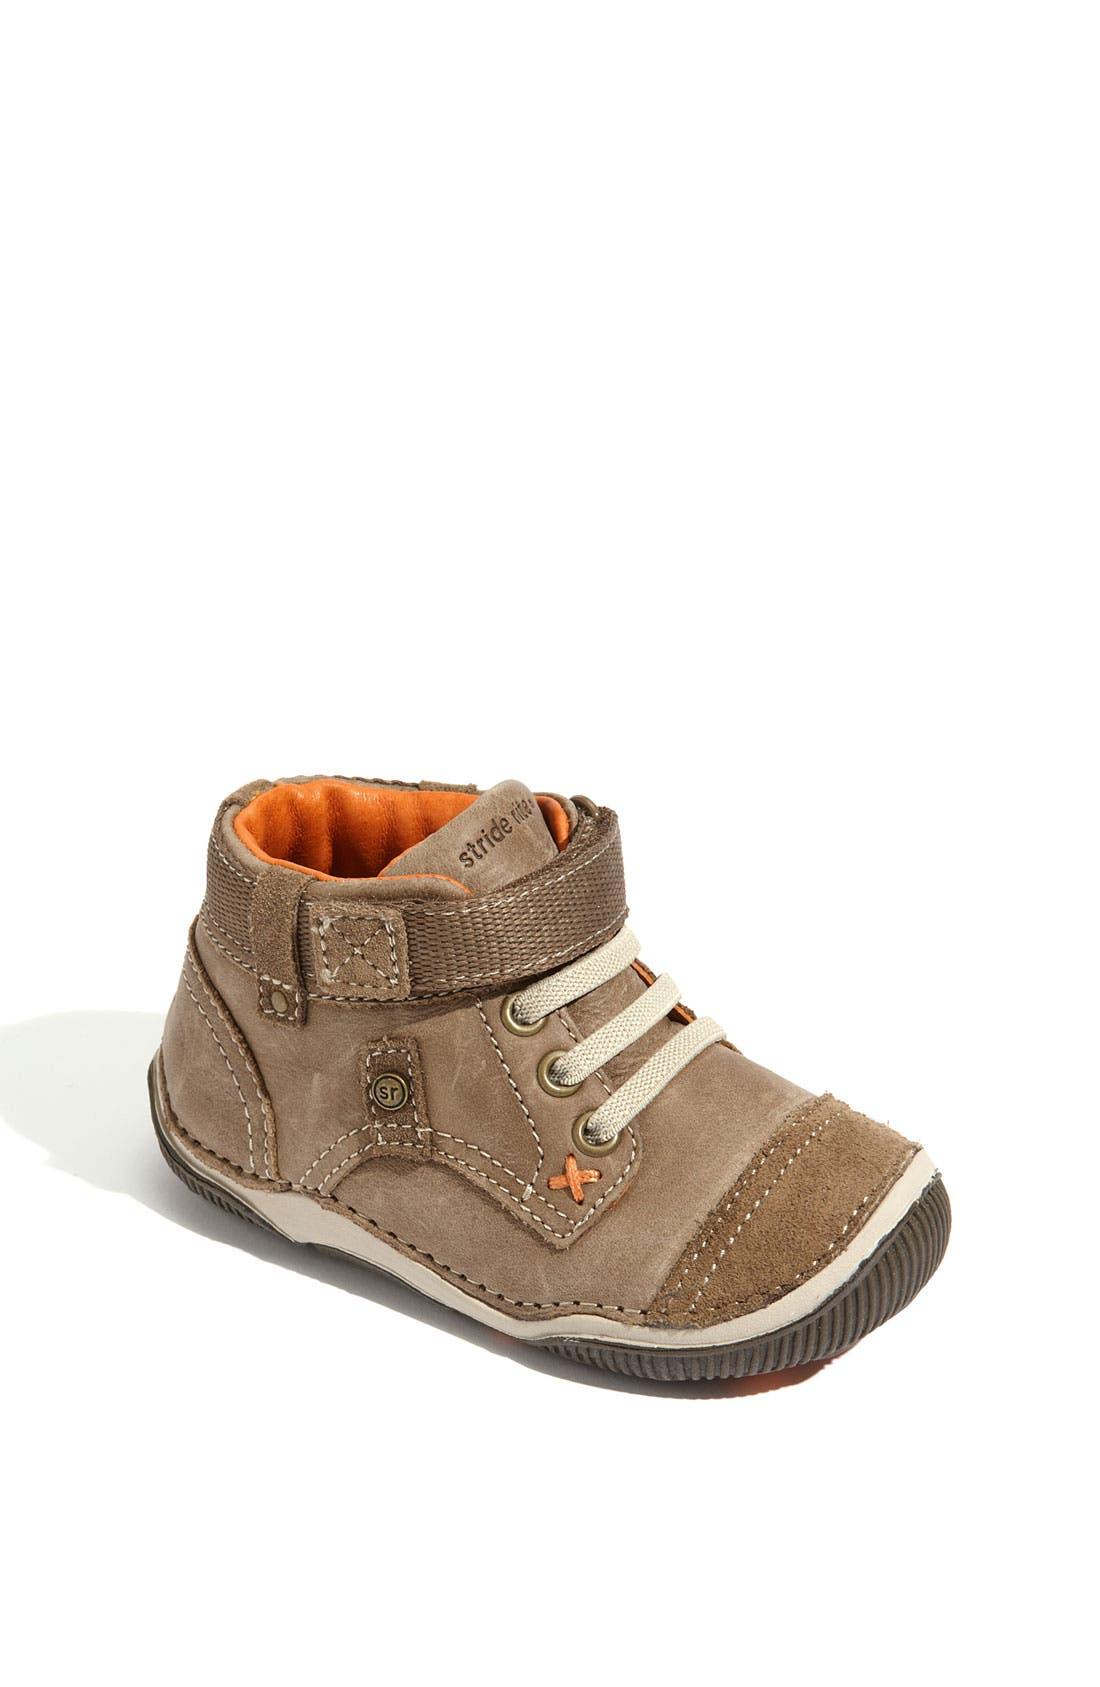 Main Image - Stride Rite 'Garett' Shoe (Baby, Walker & Toddler)